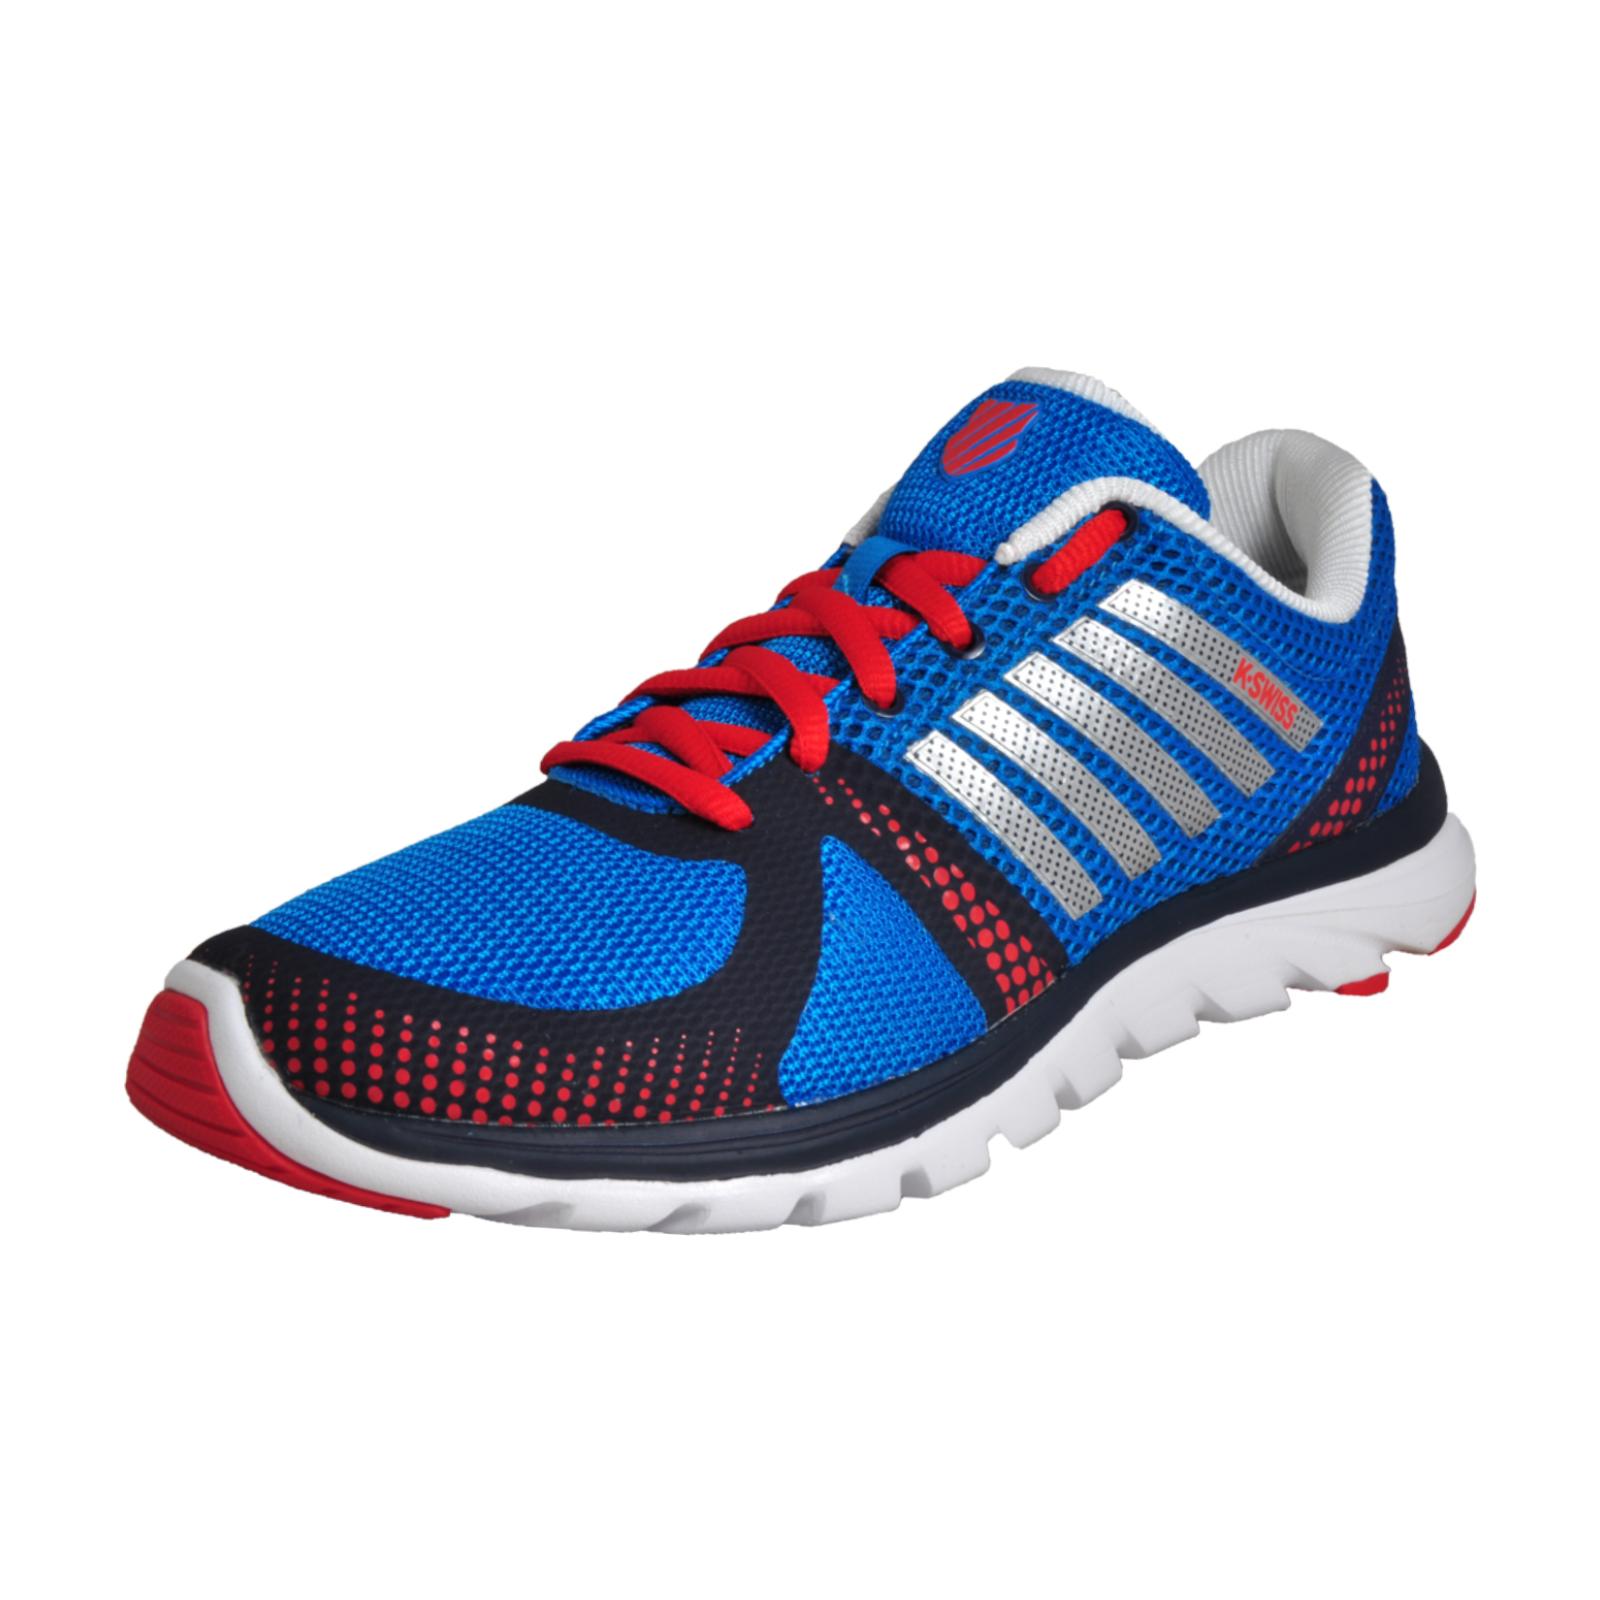 watch 0b9b8 3ed56 Lite K Gym Trainers Shoes Blue X Men s Blades Running Fitness Swiss SrwatSqF